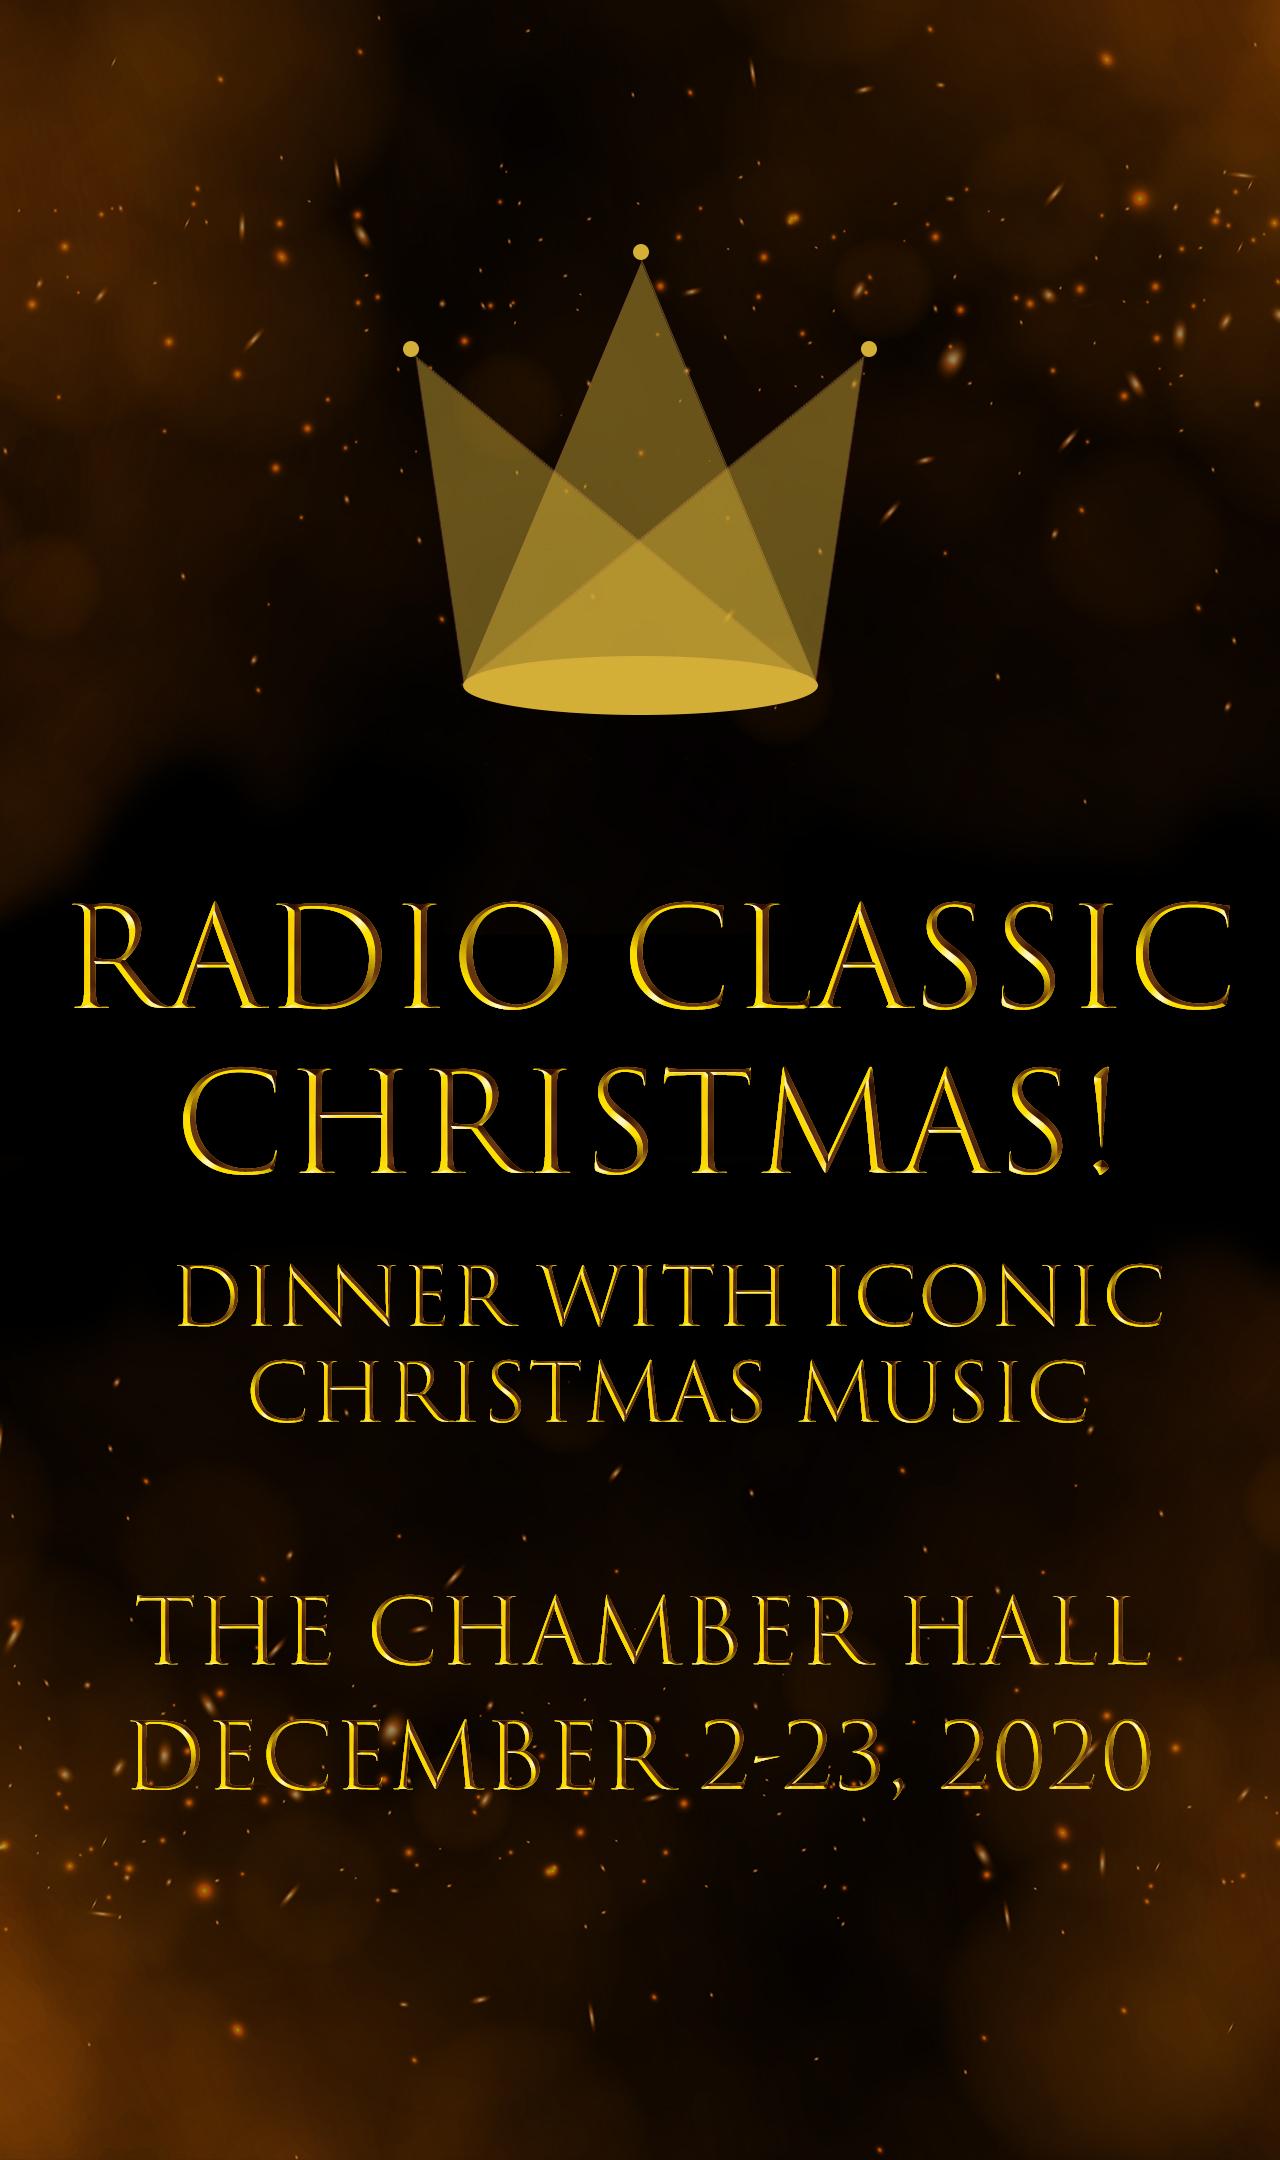 Radio Classic Christmas!